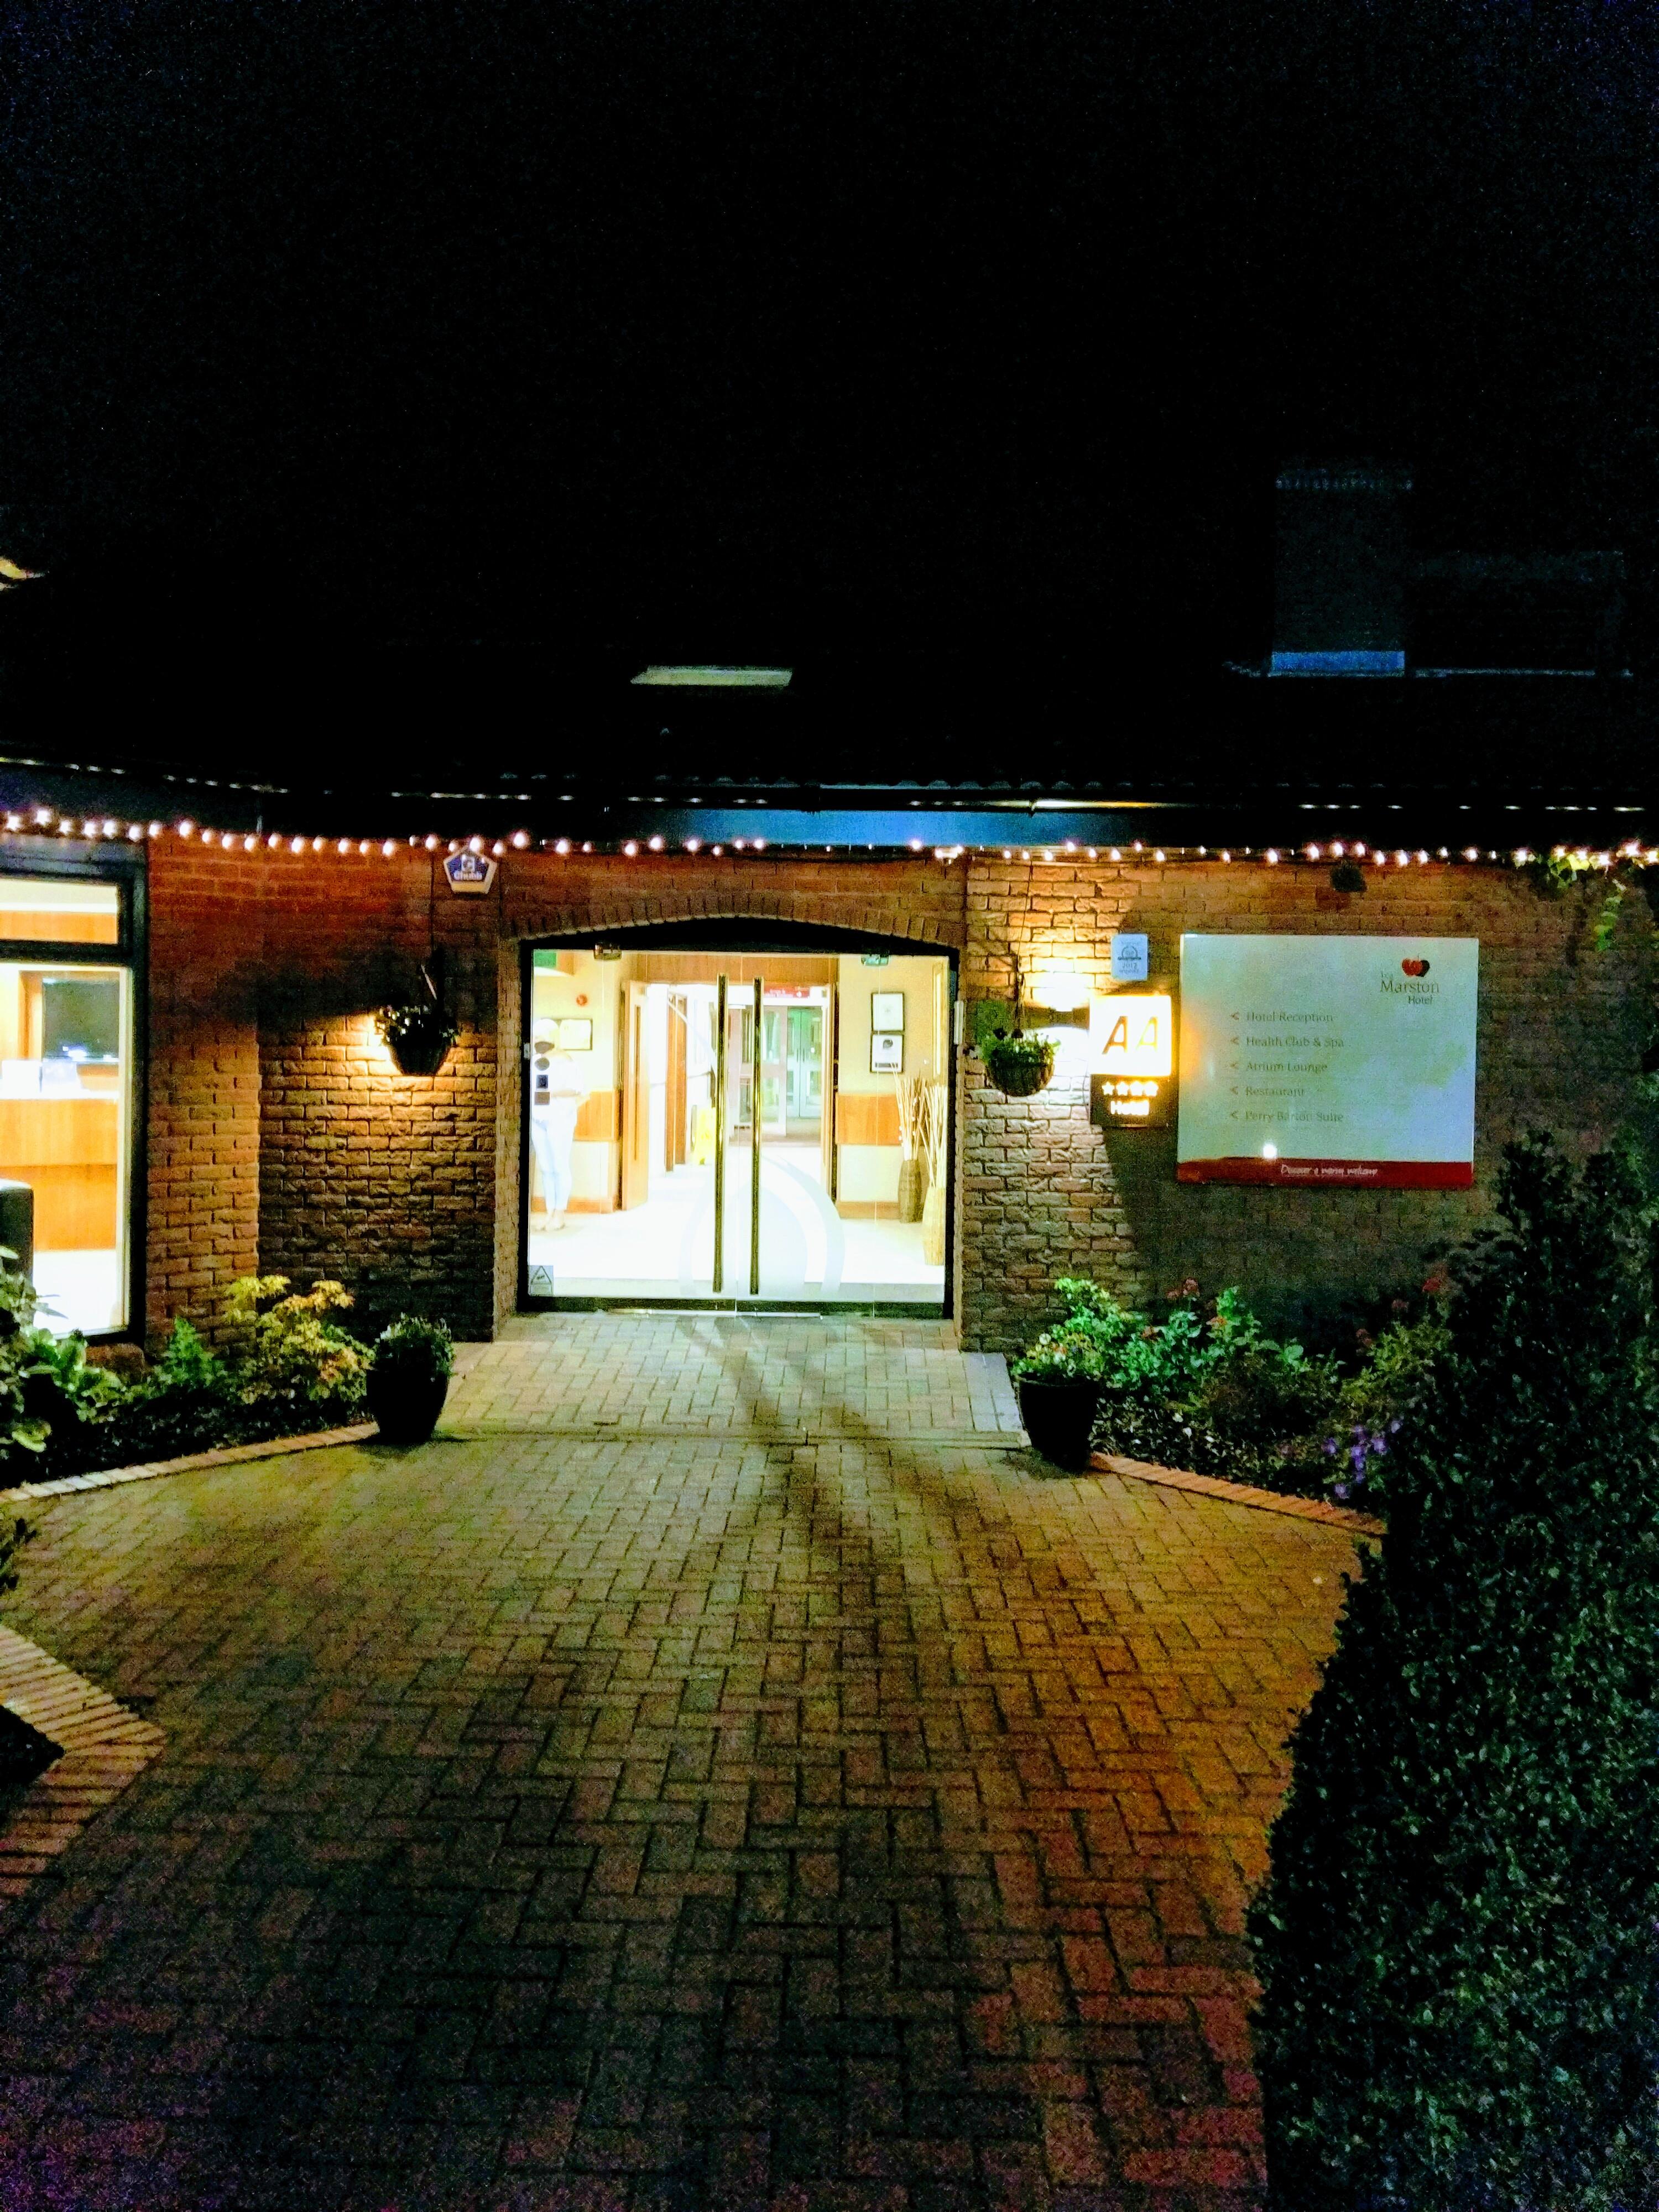 The Lea Marston Hotel, Sutton Coldfield, UK